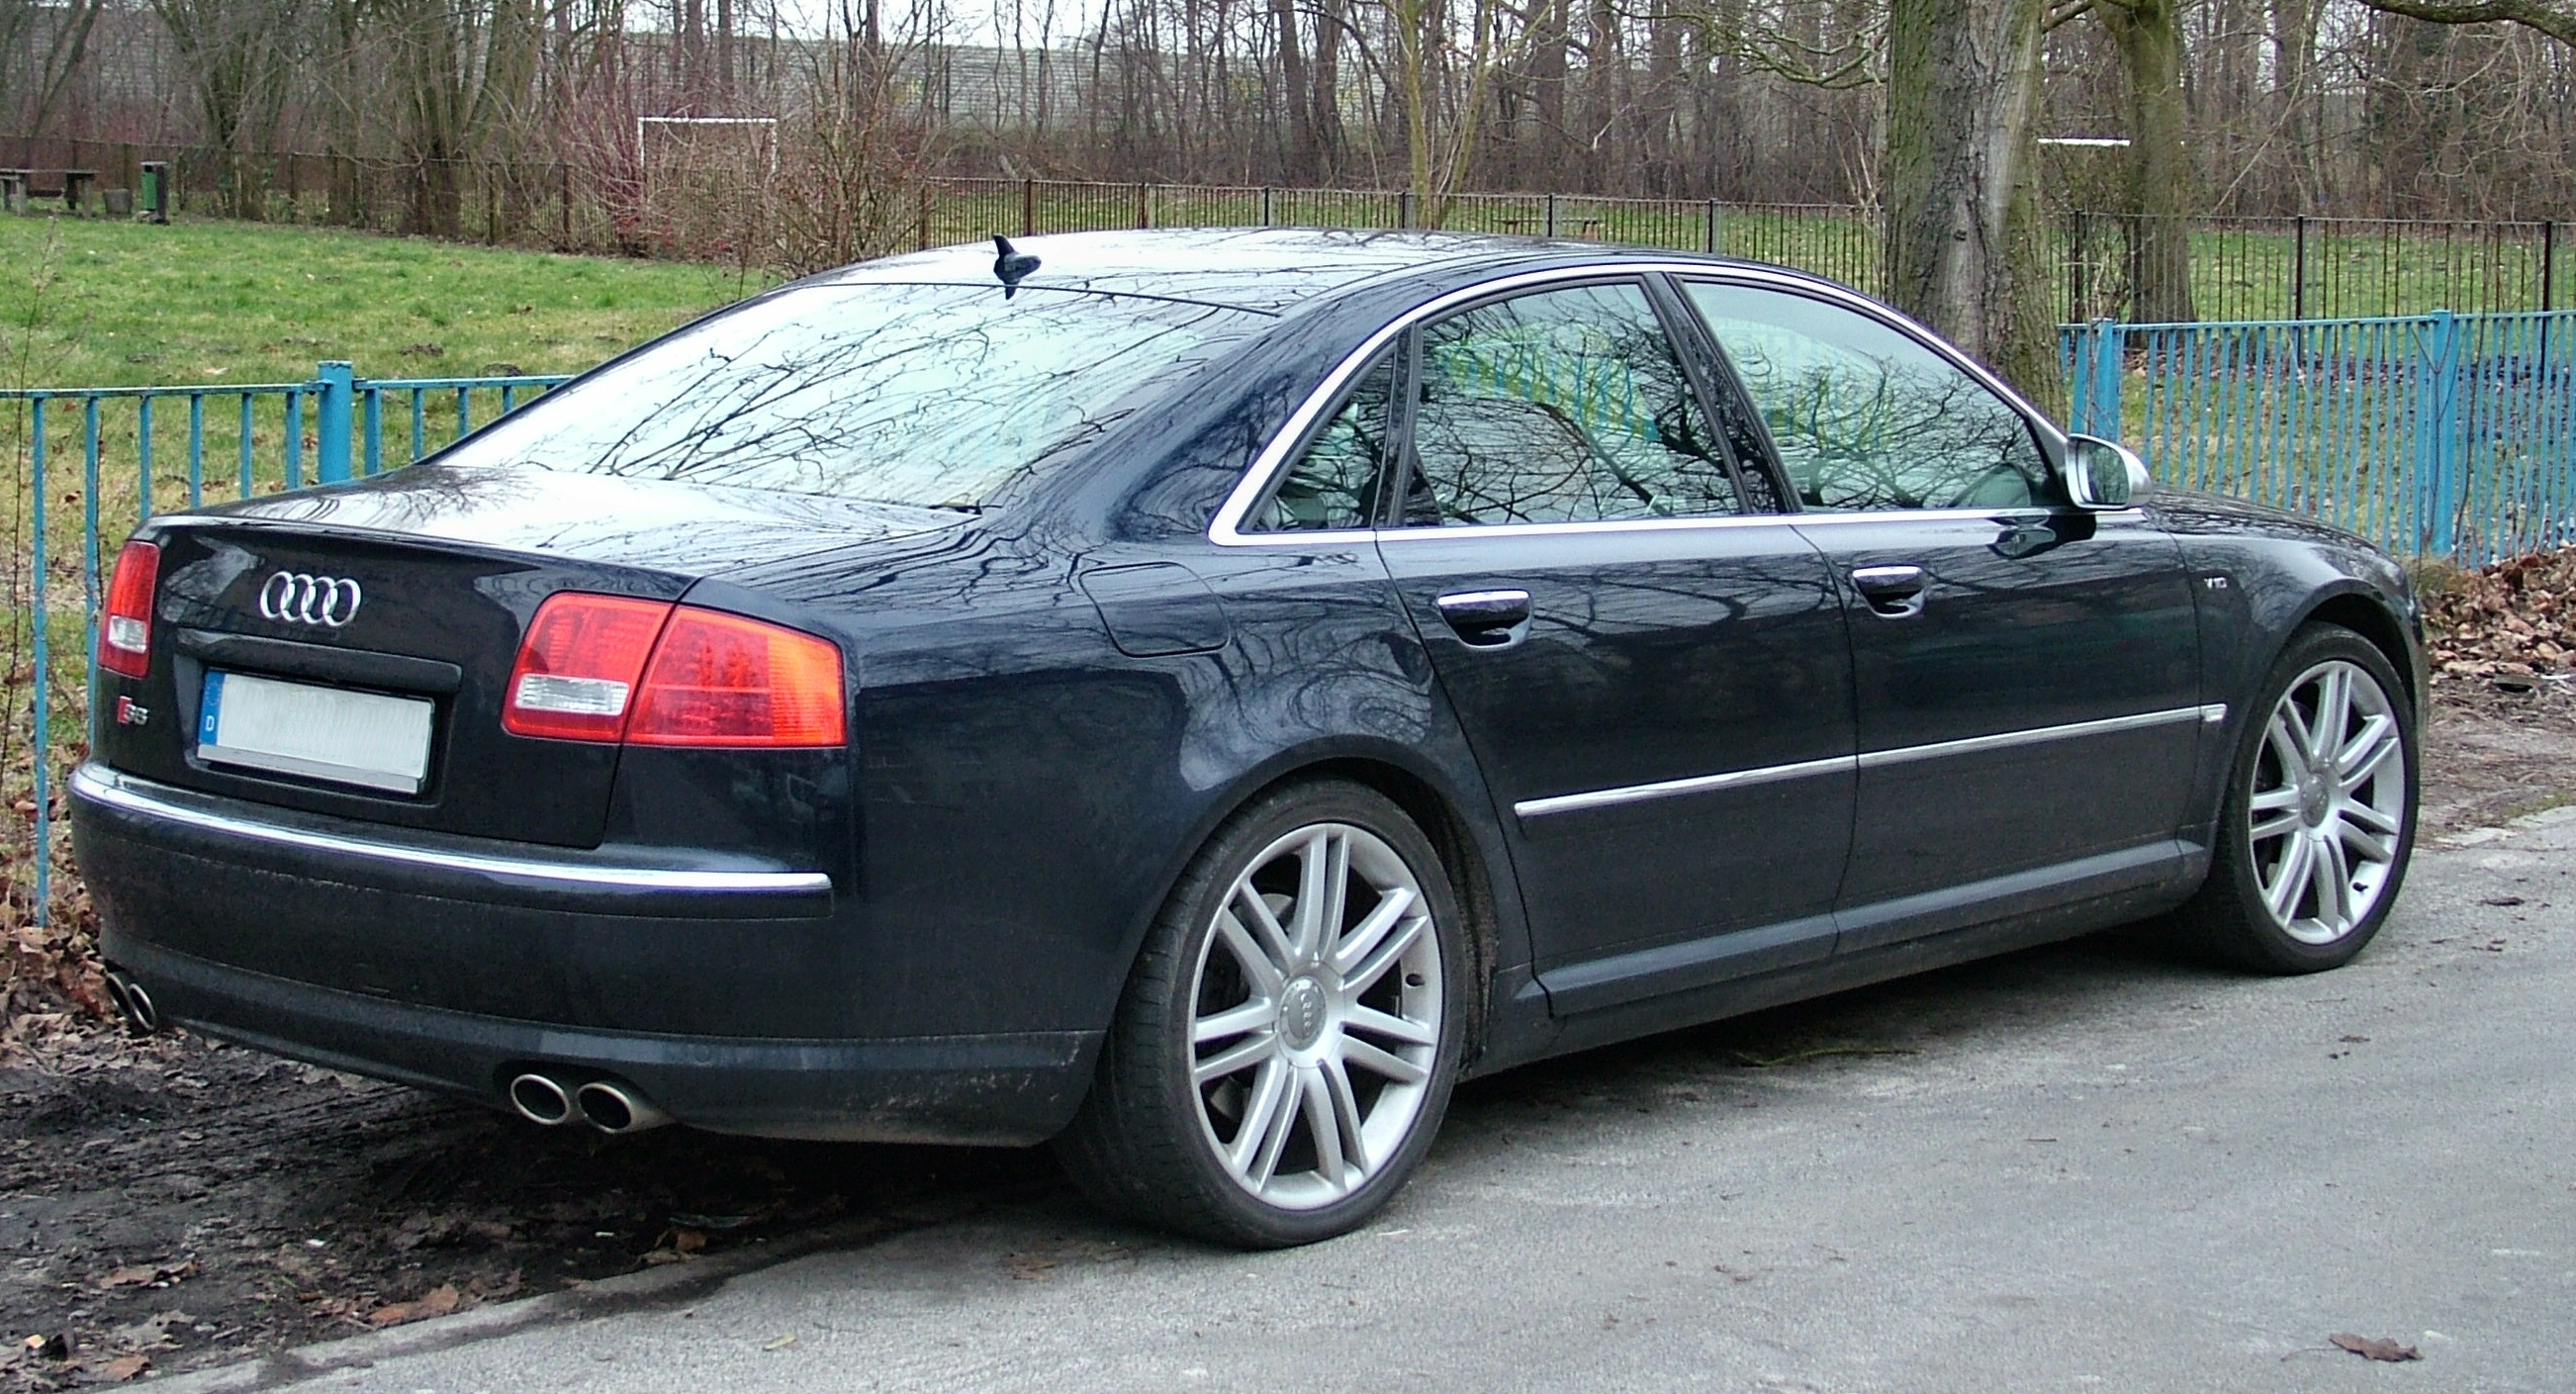 Kelebihan Kekurangan Audi S8 2008 Review